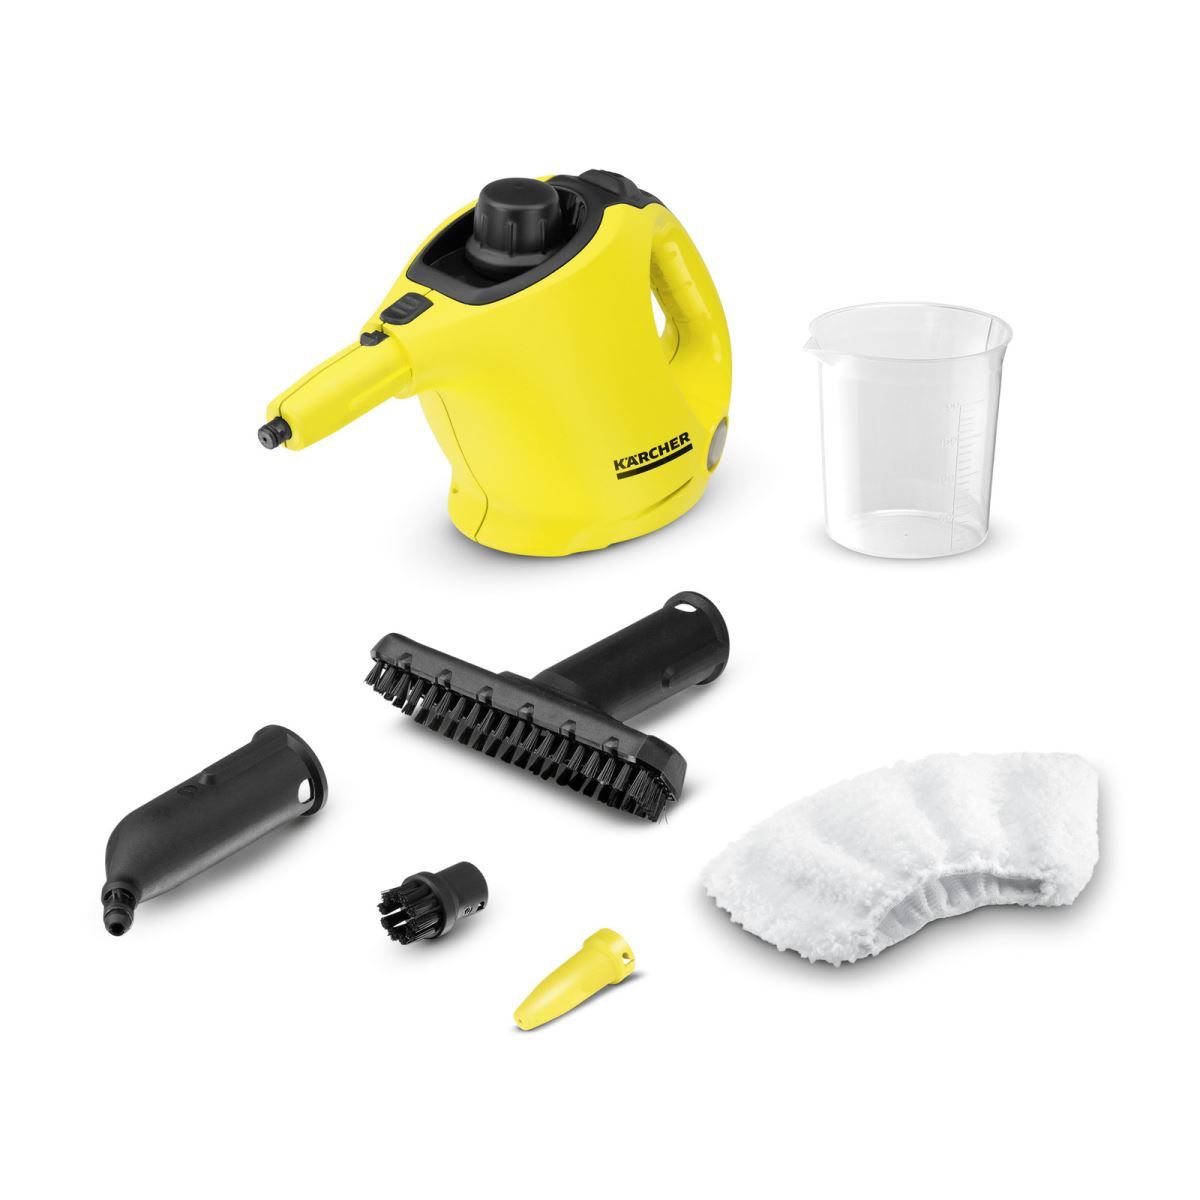 Curățitor cu abur Karcher SC 1 (Yellow) *EU 15163000